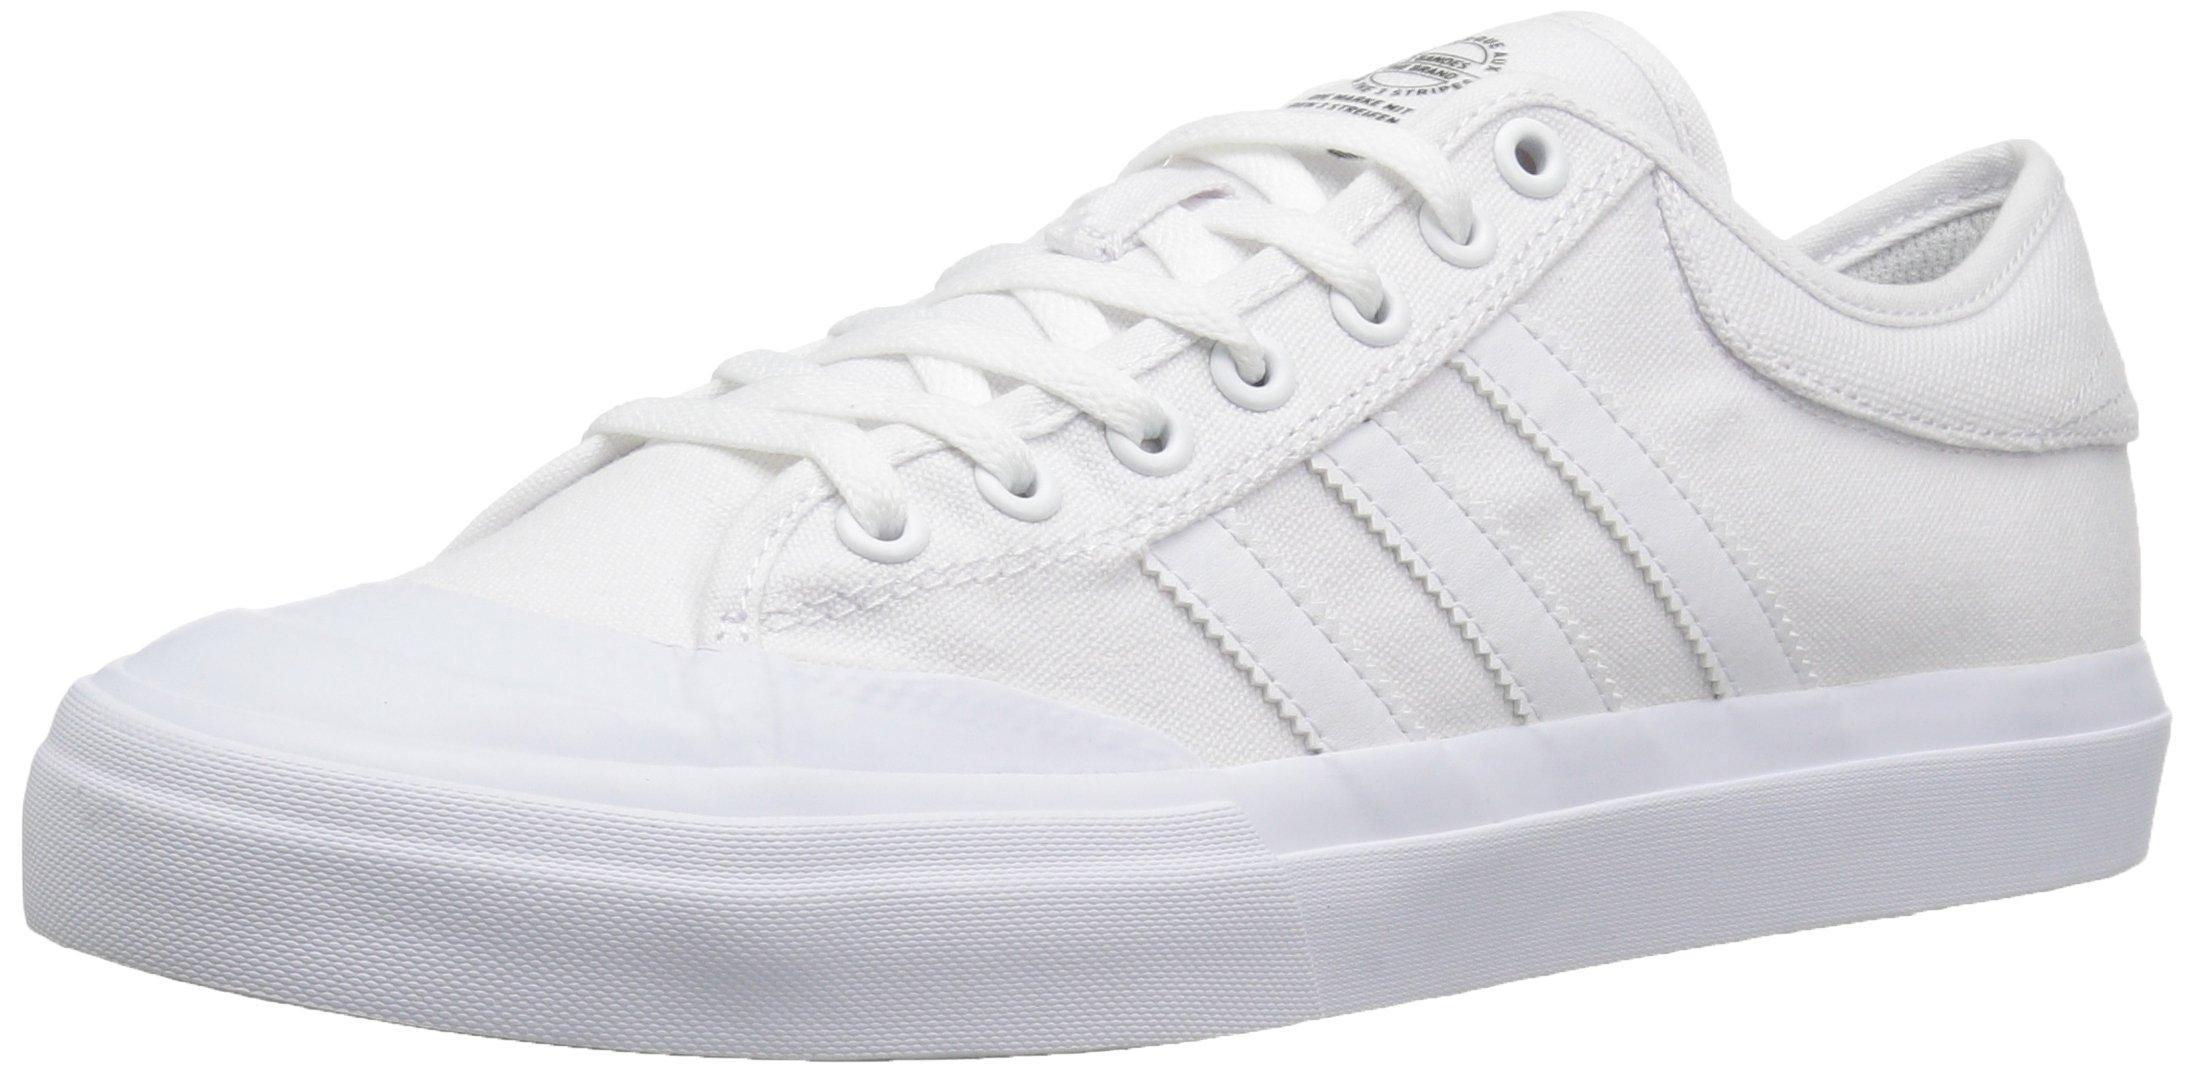 Matchcourt Fashion Sneakers